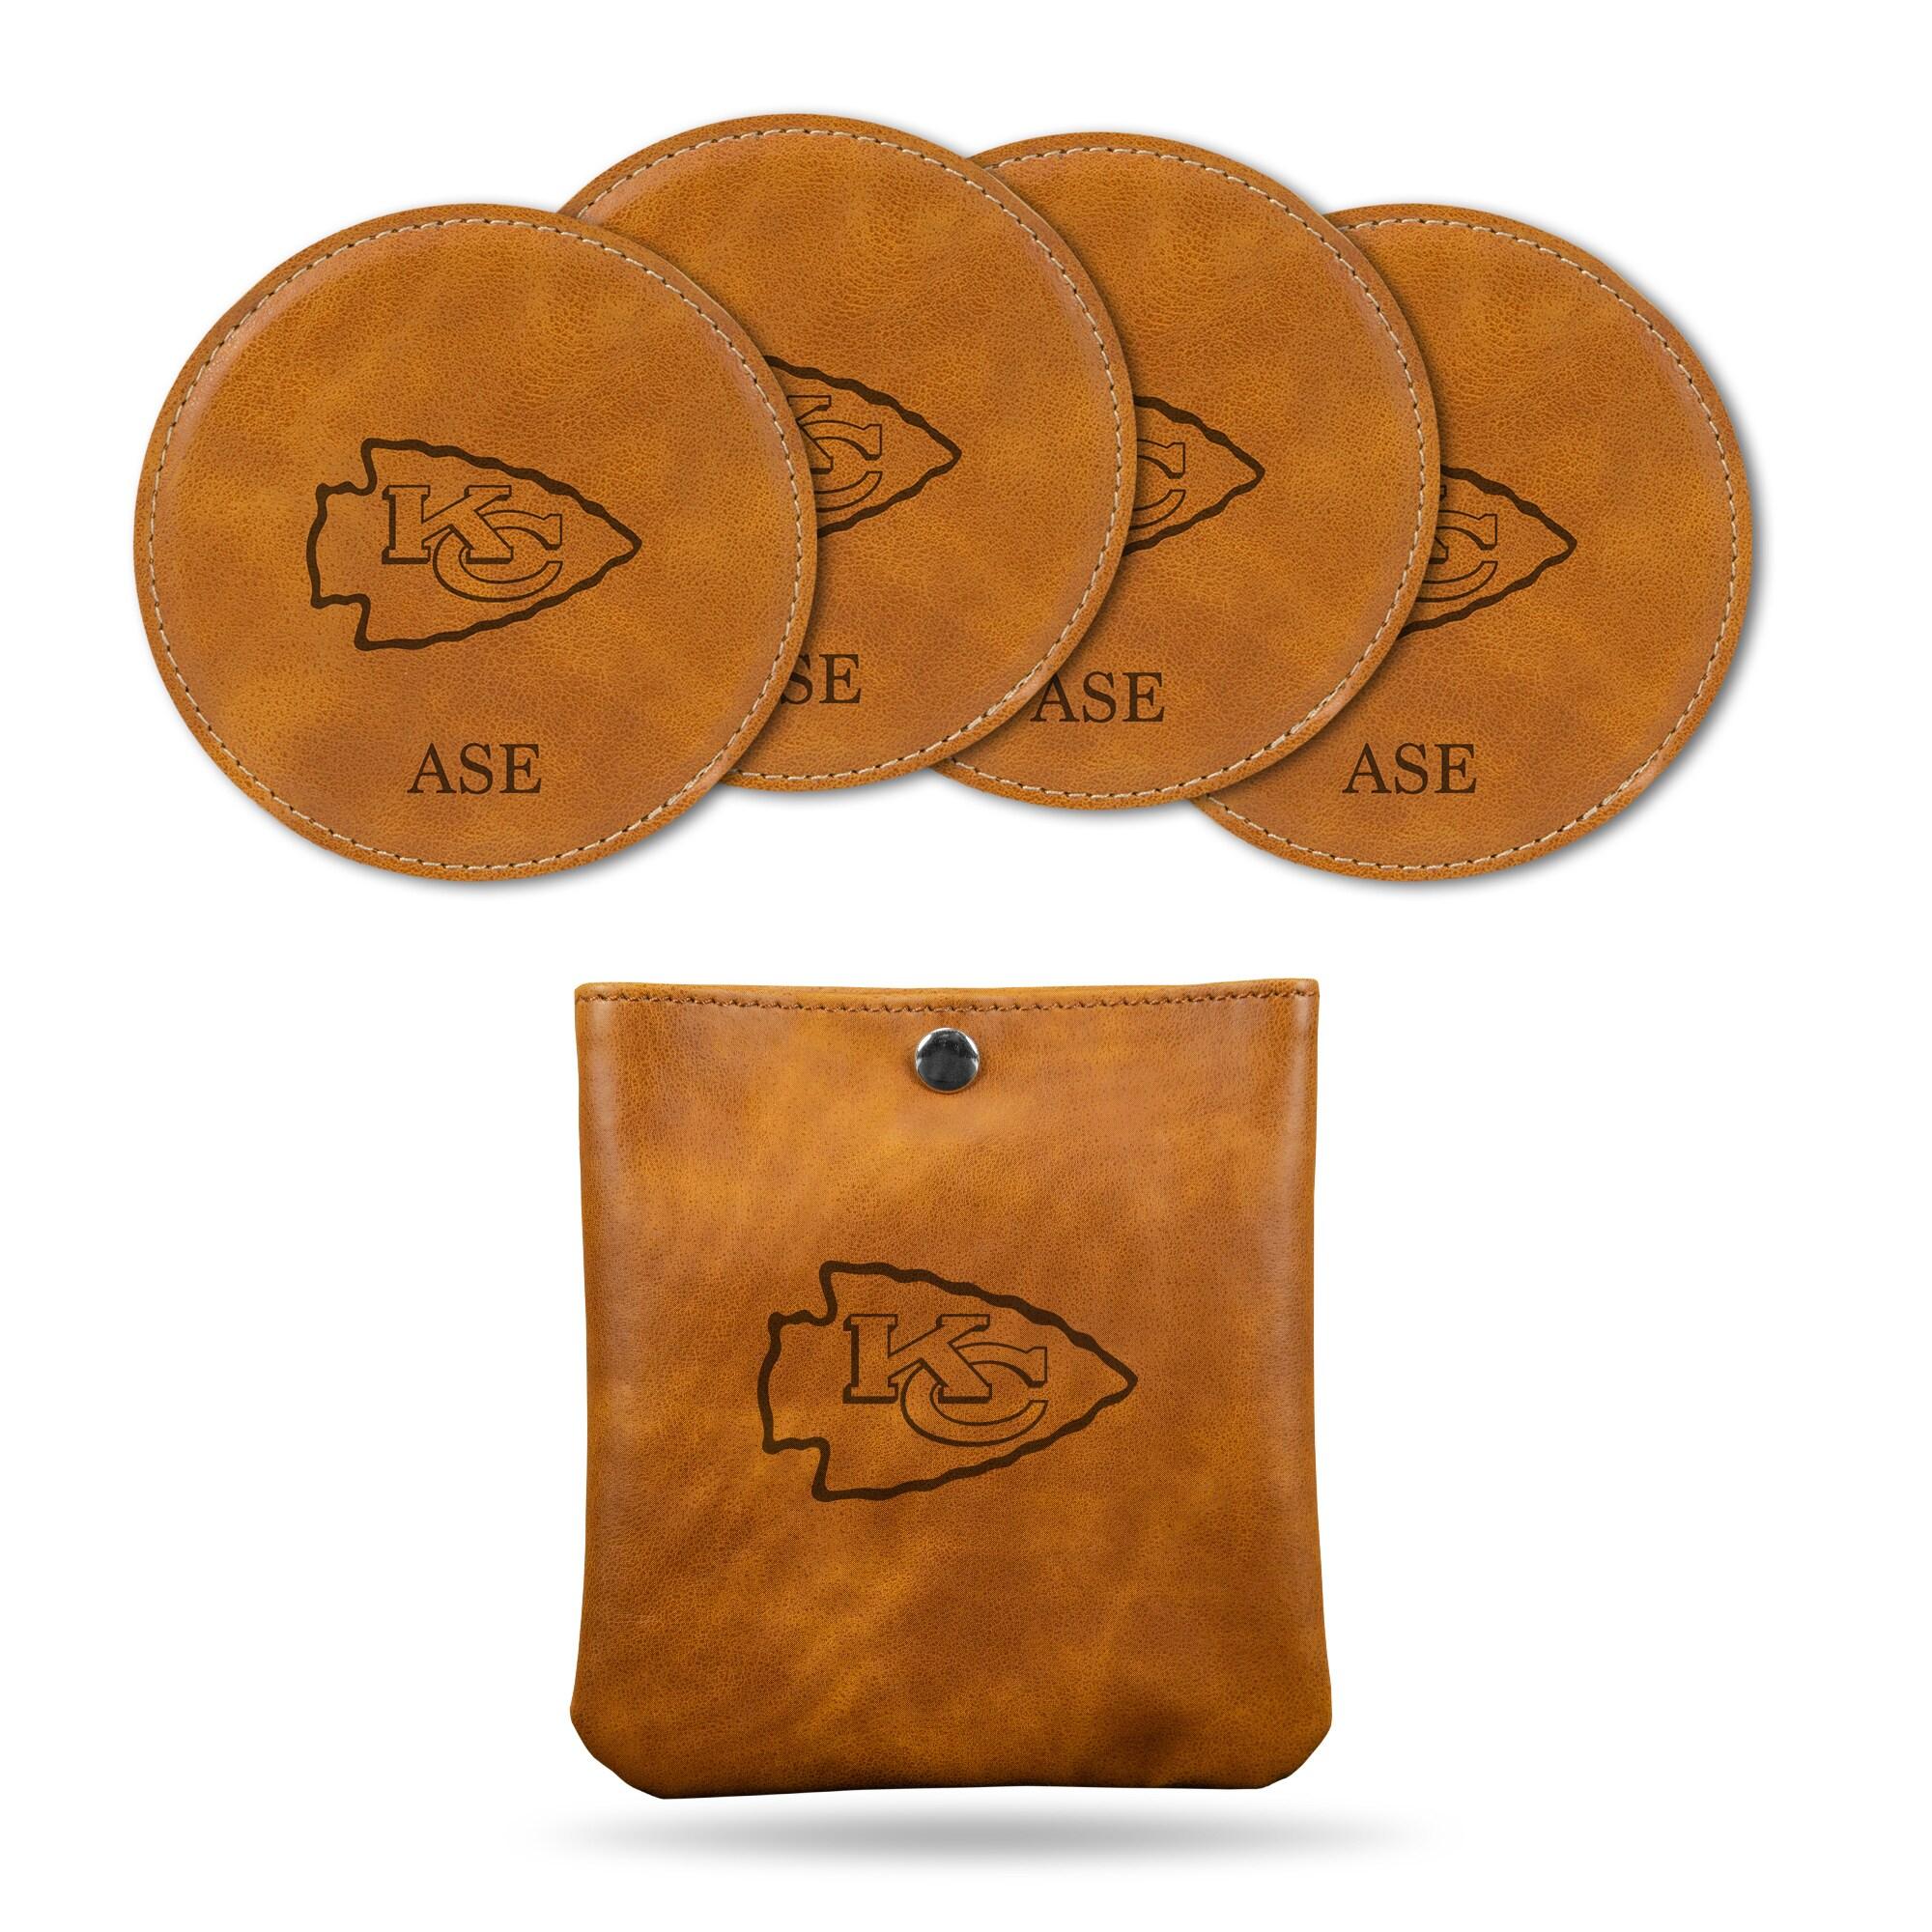 Kansas City Chiefs Sparo 4-Pack Personalized Coaster Set - Brown